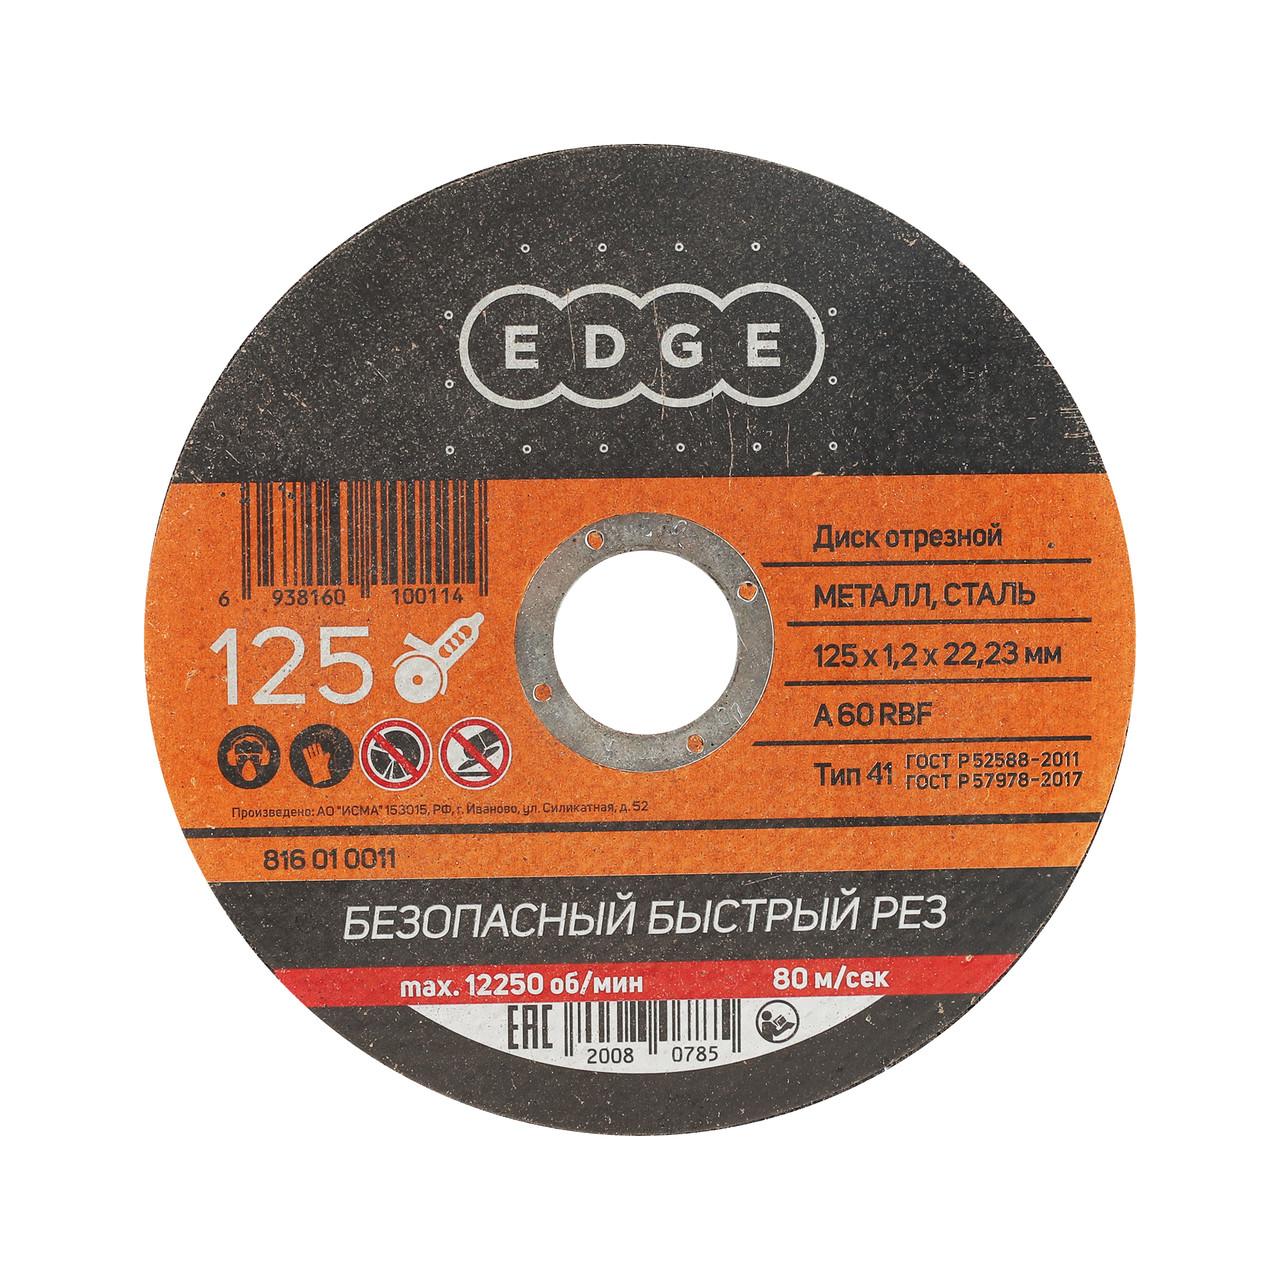 Диск отрезной EDGE by PATRIOT 125*1,2*22,23  по металлу (Россия)